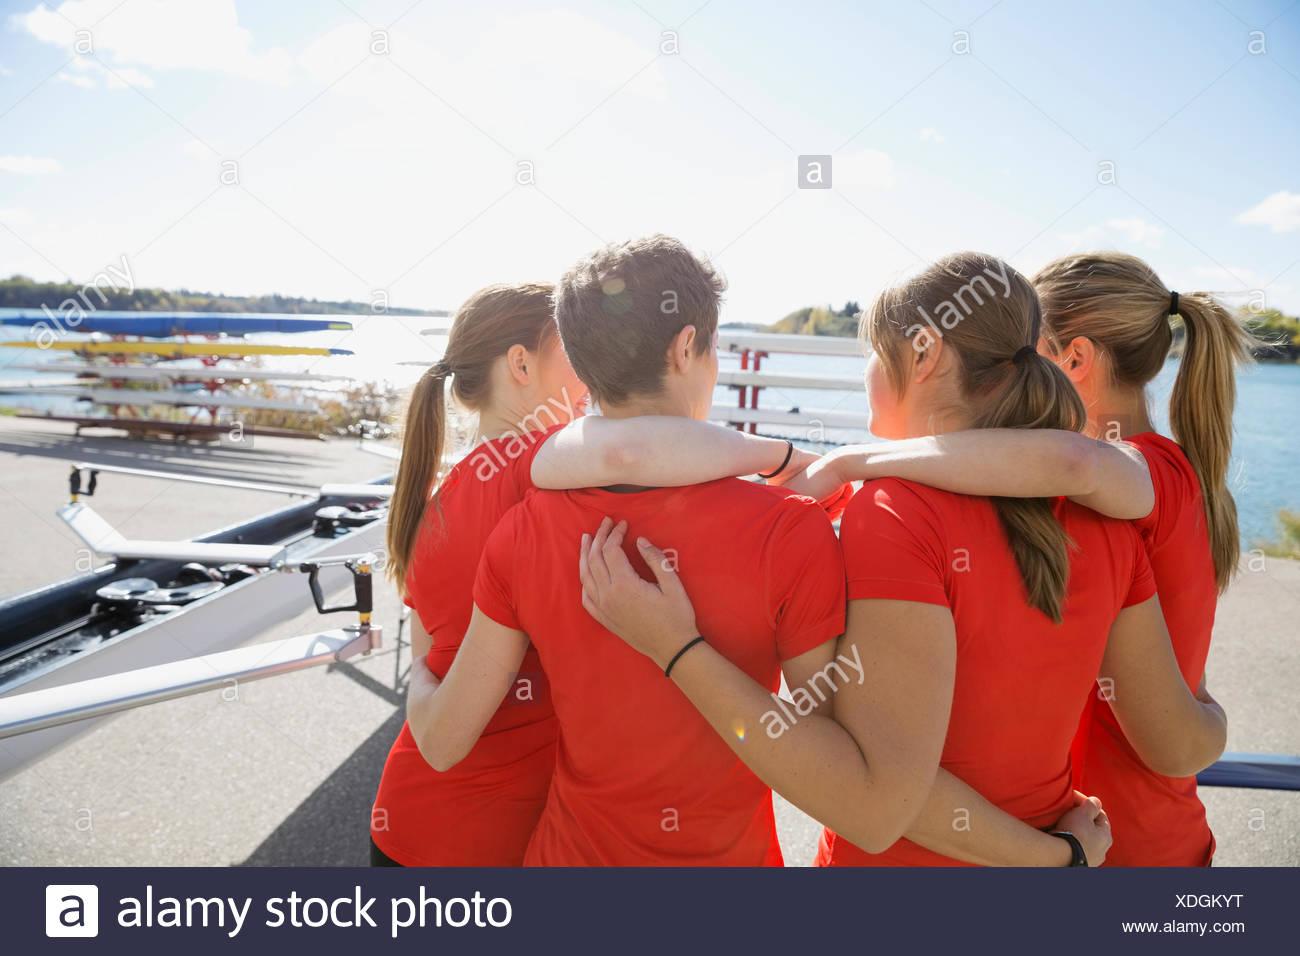 Rudern, Team umarmt im waterfront Stockbild